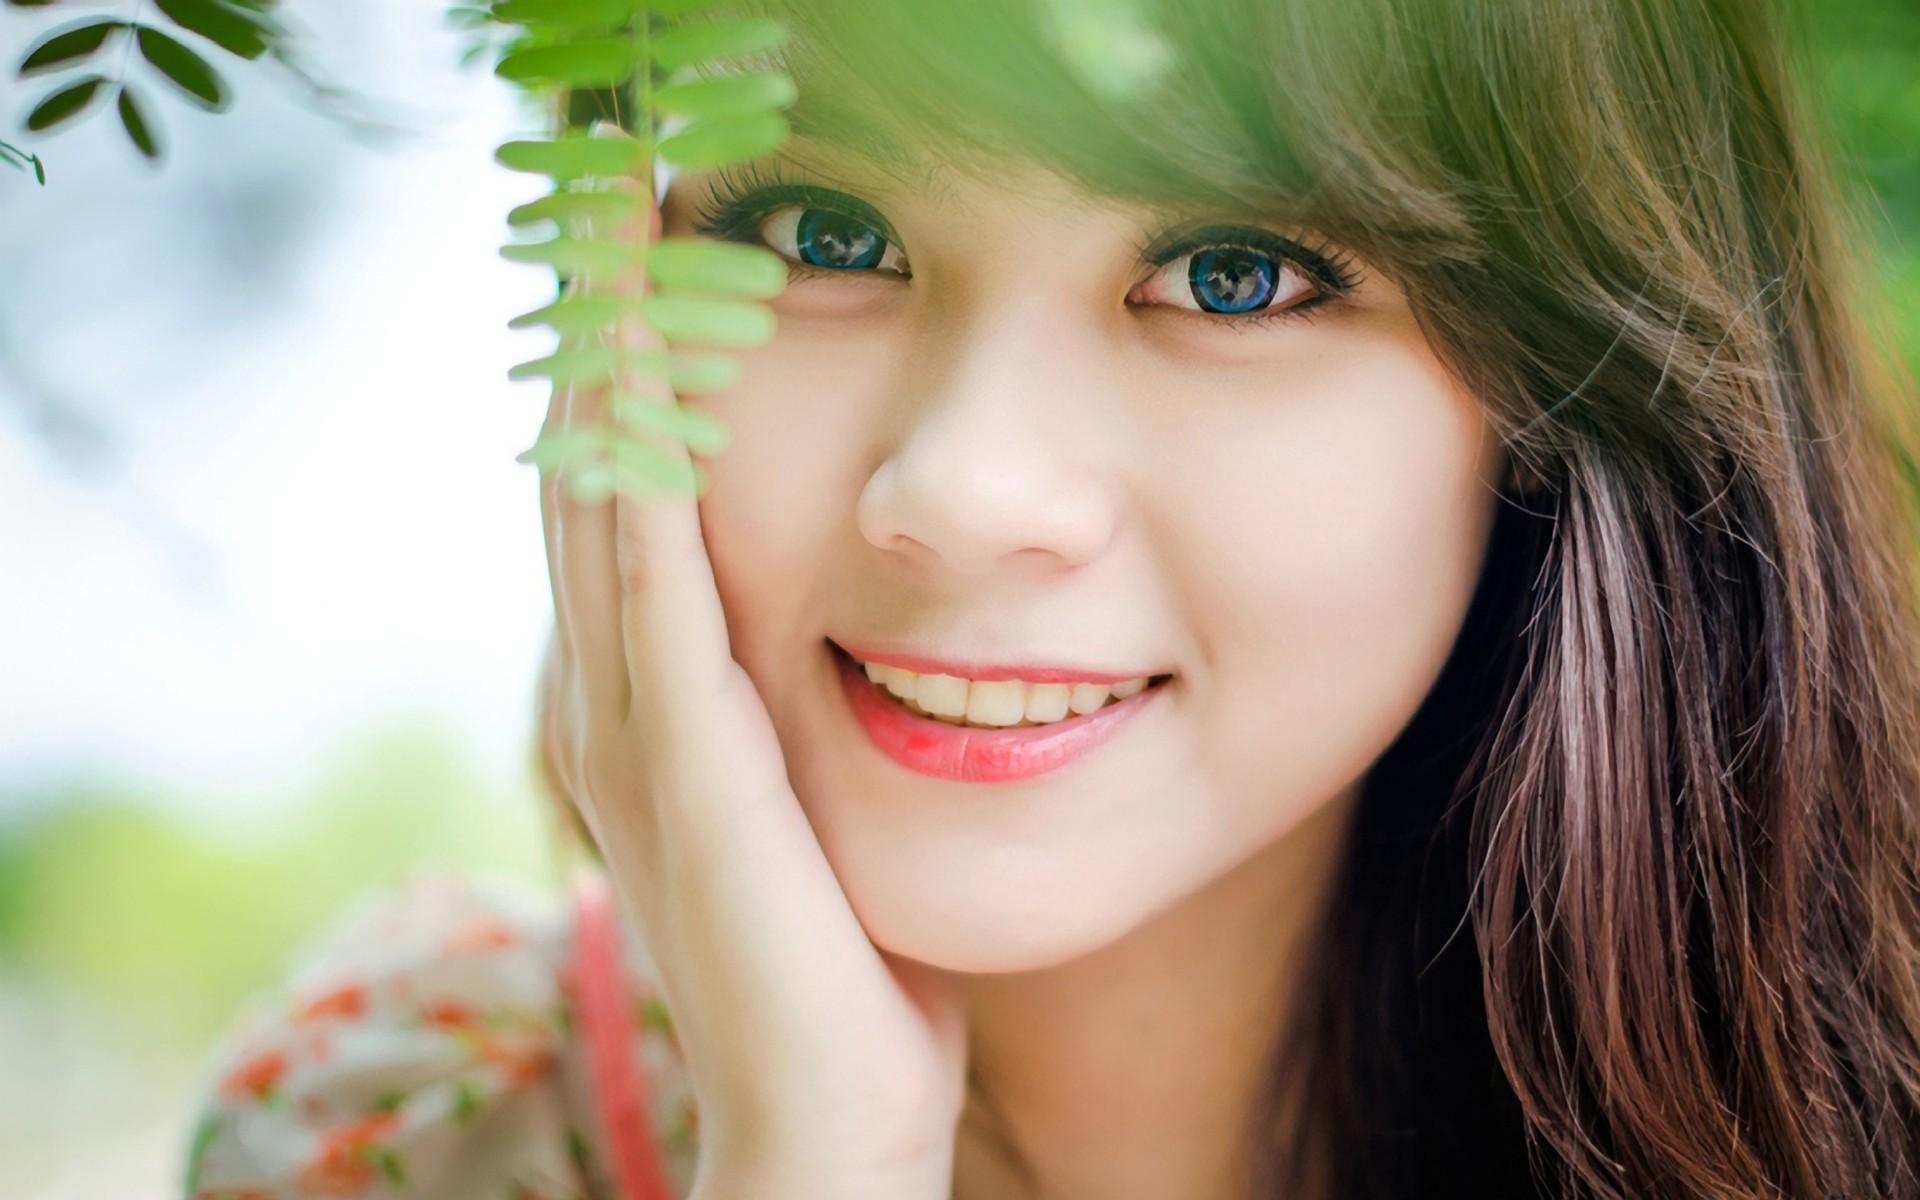 http://www.zastavki.com/pictures/originals/2013/Girls___Beautyful_Girls_Joy_in_the_eyes_of_the_girl_054395_.jpg